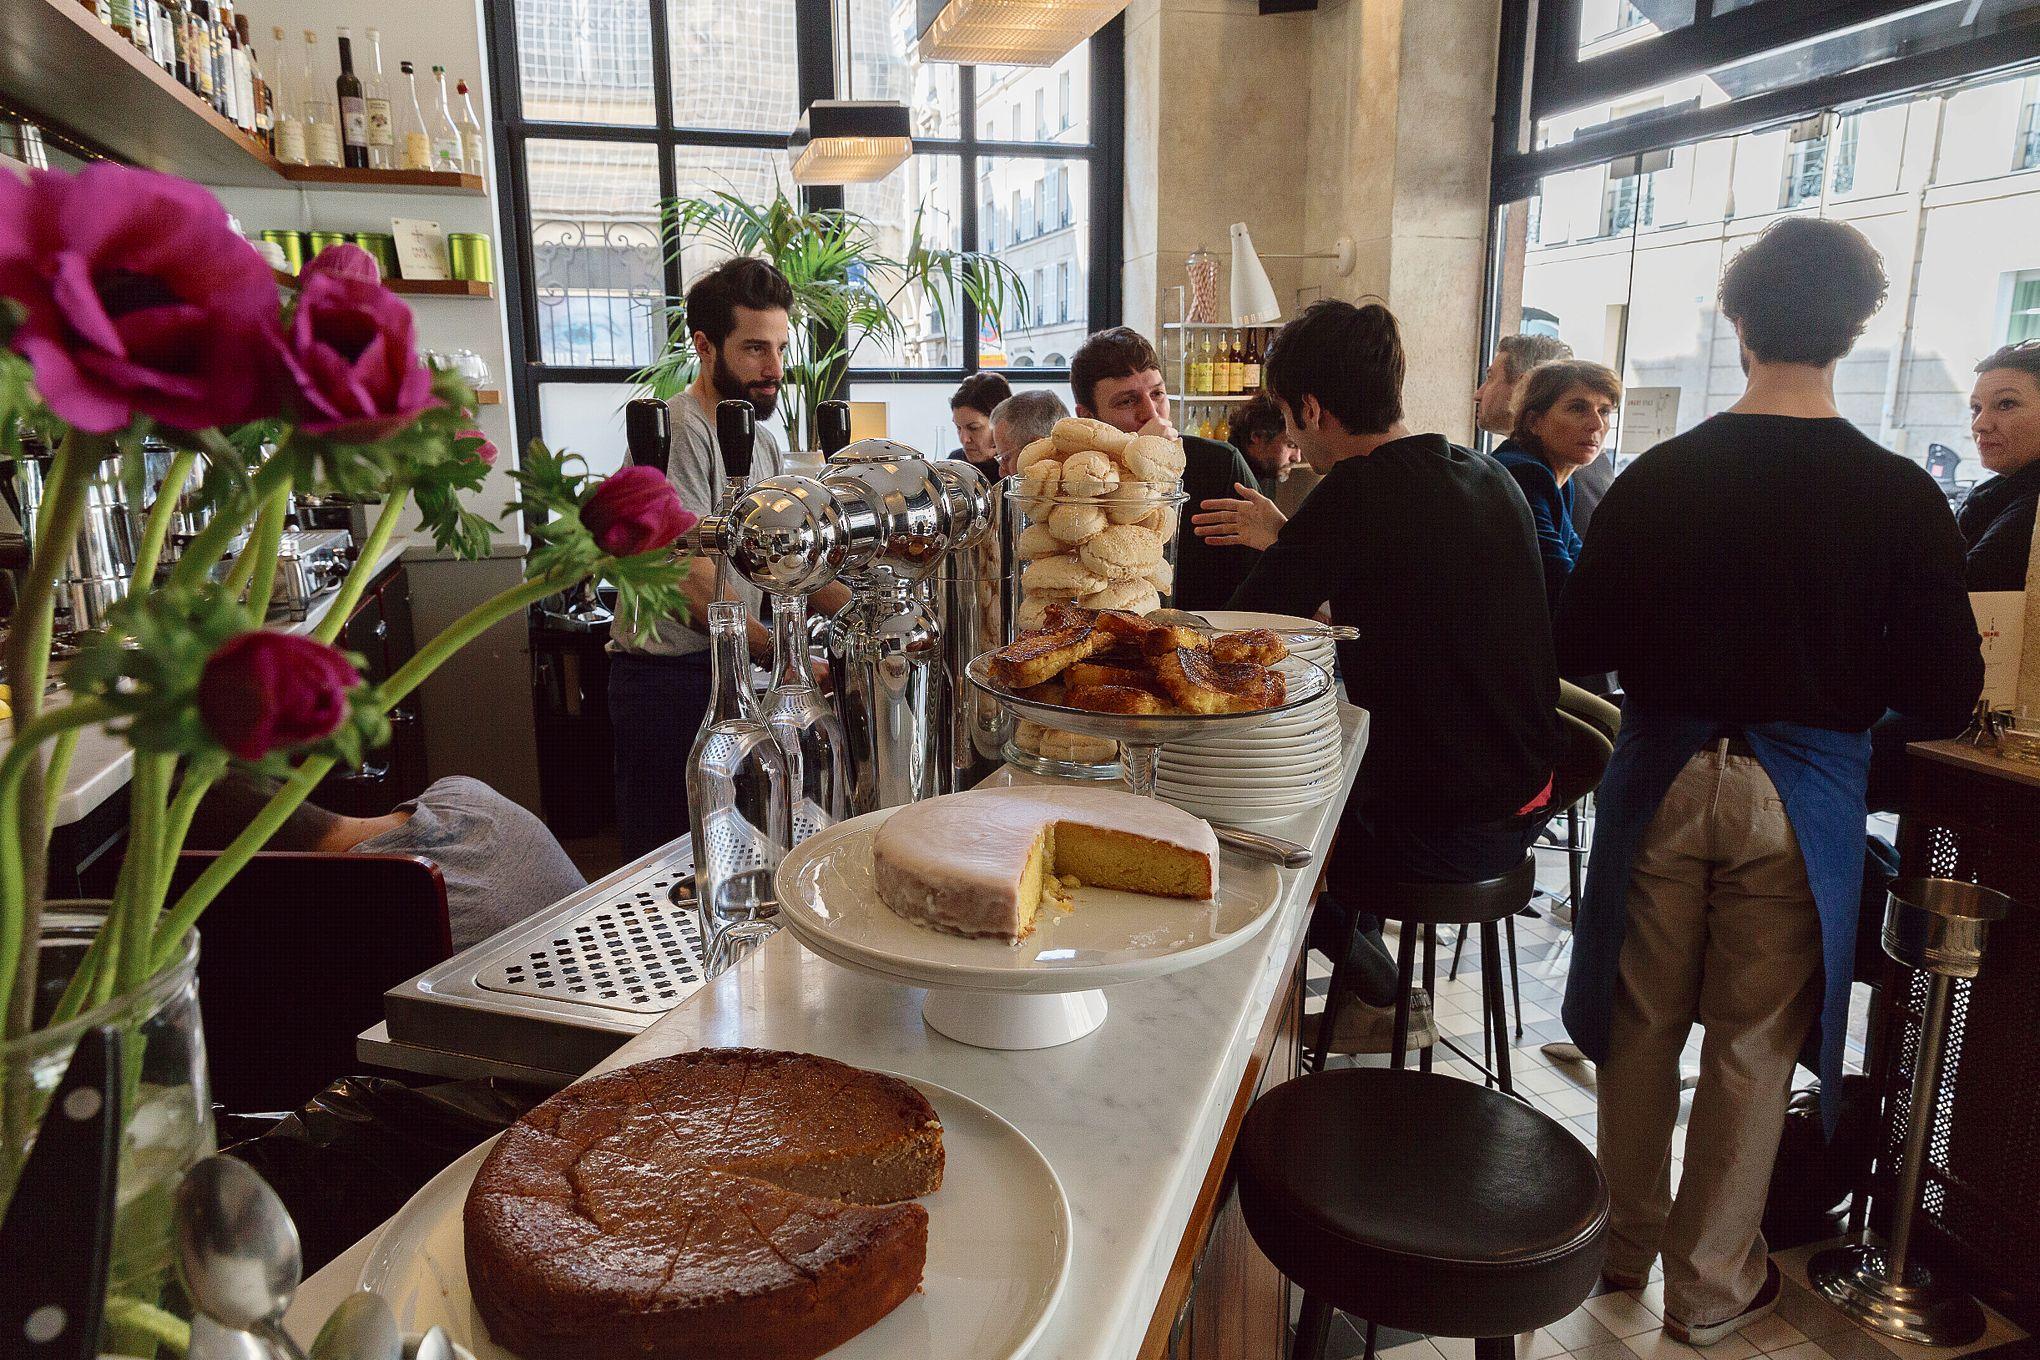 23 Rue Du Cherche Midi les bonnes tables de la rue du cherche-midi